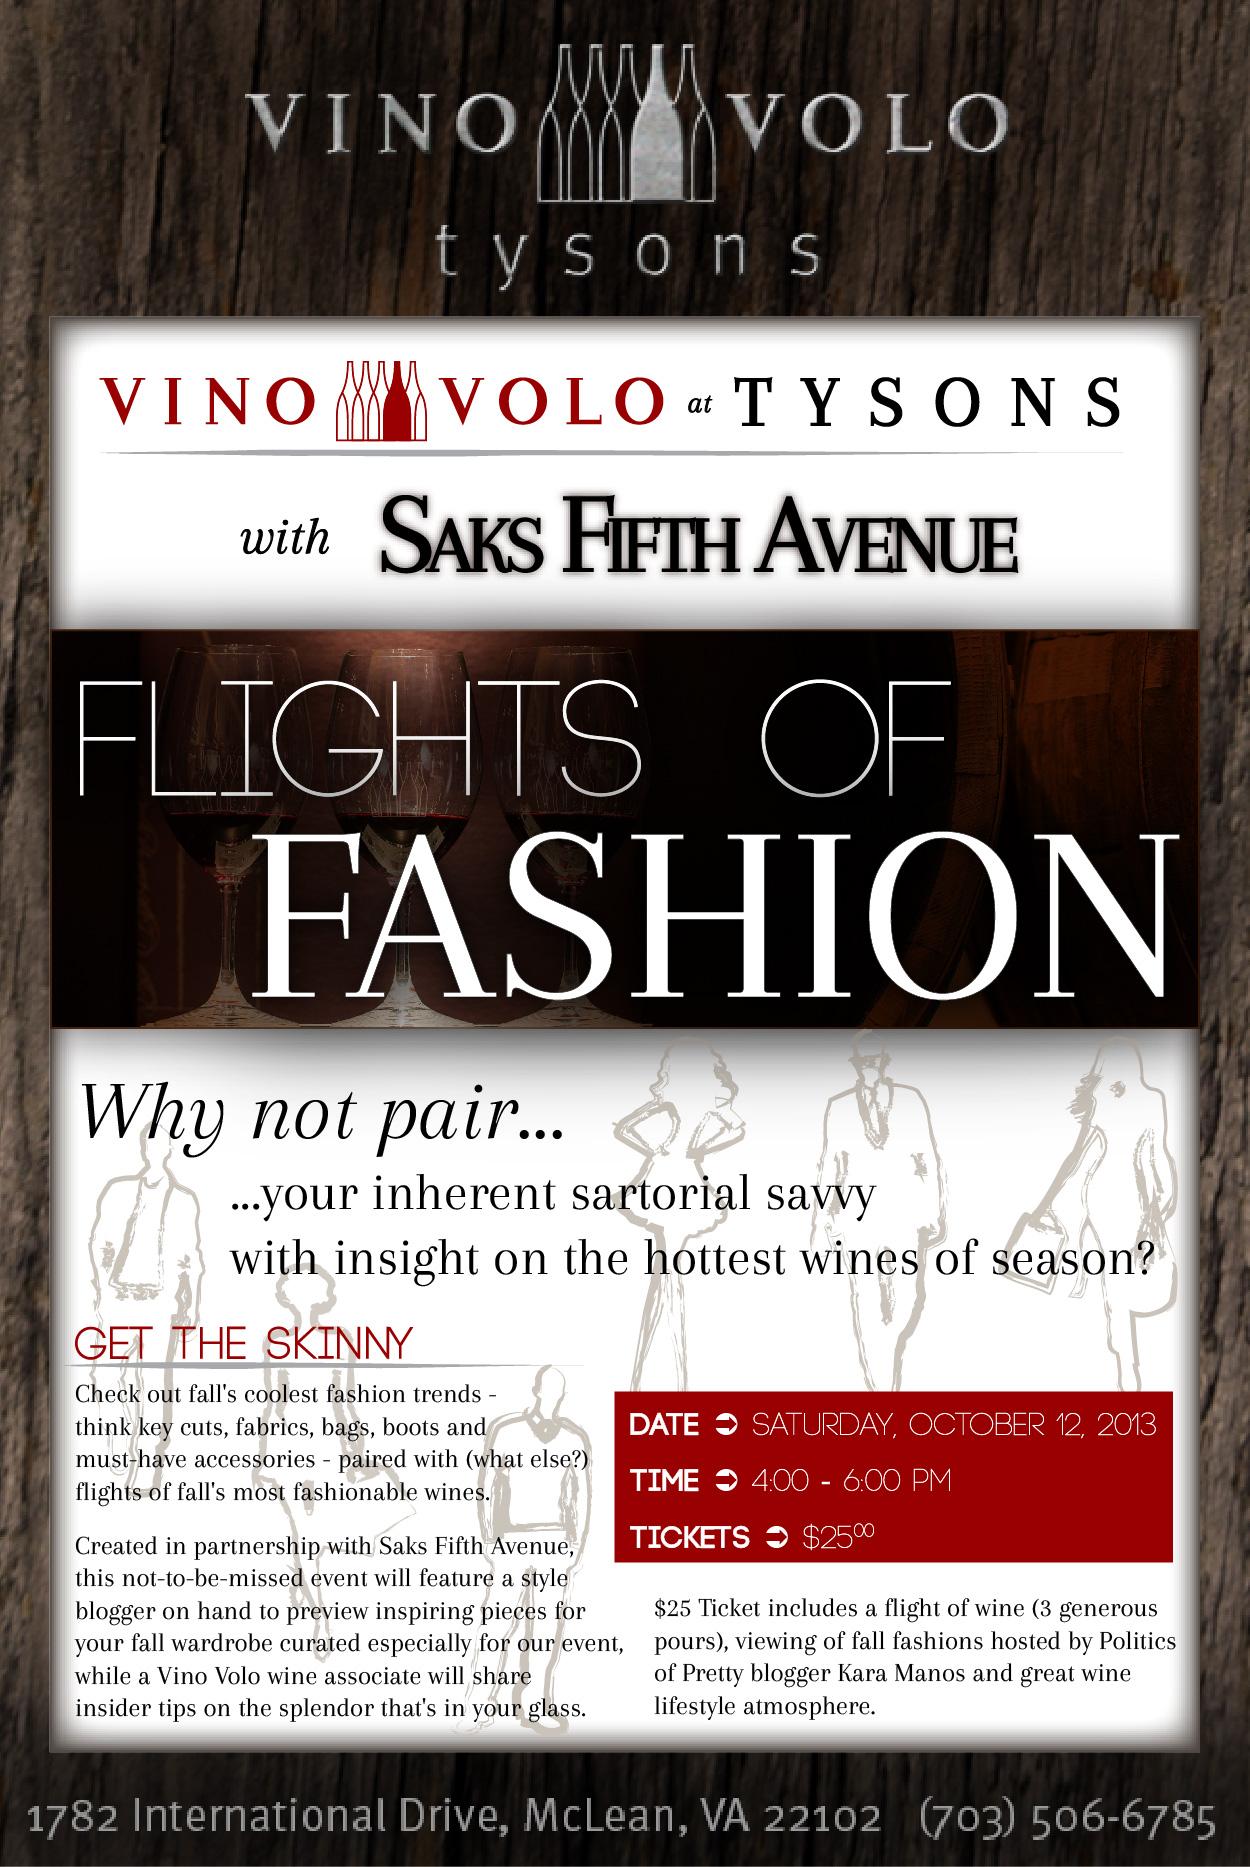 Vino Volo Tysons_Flights of Fashion Event Page